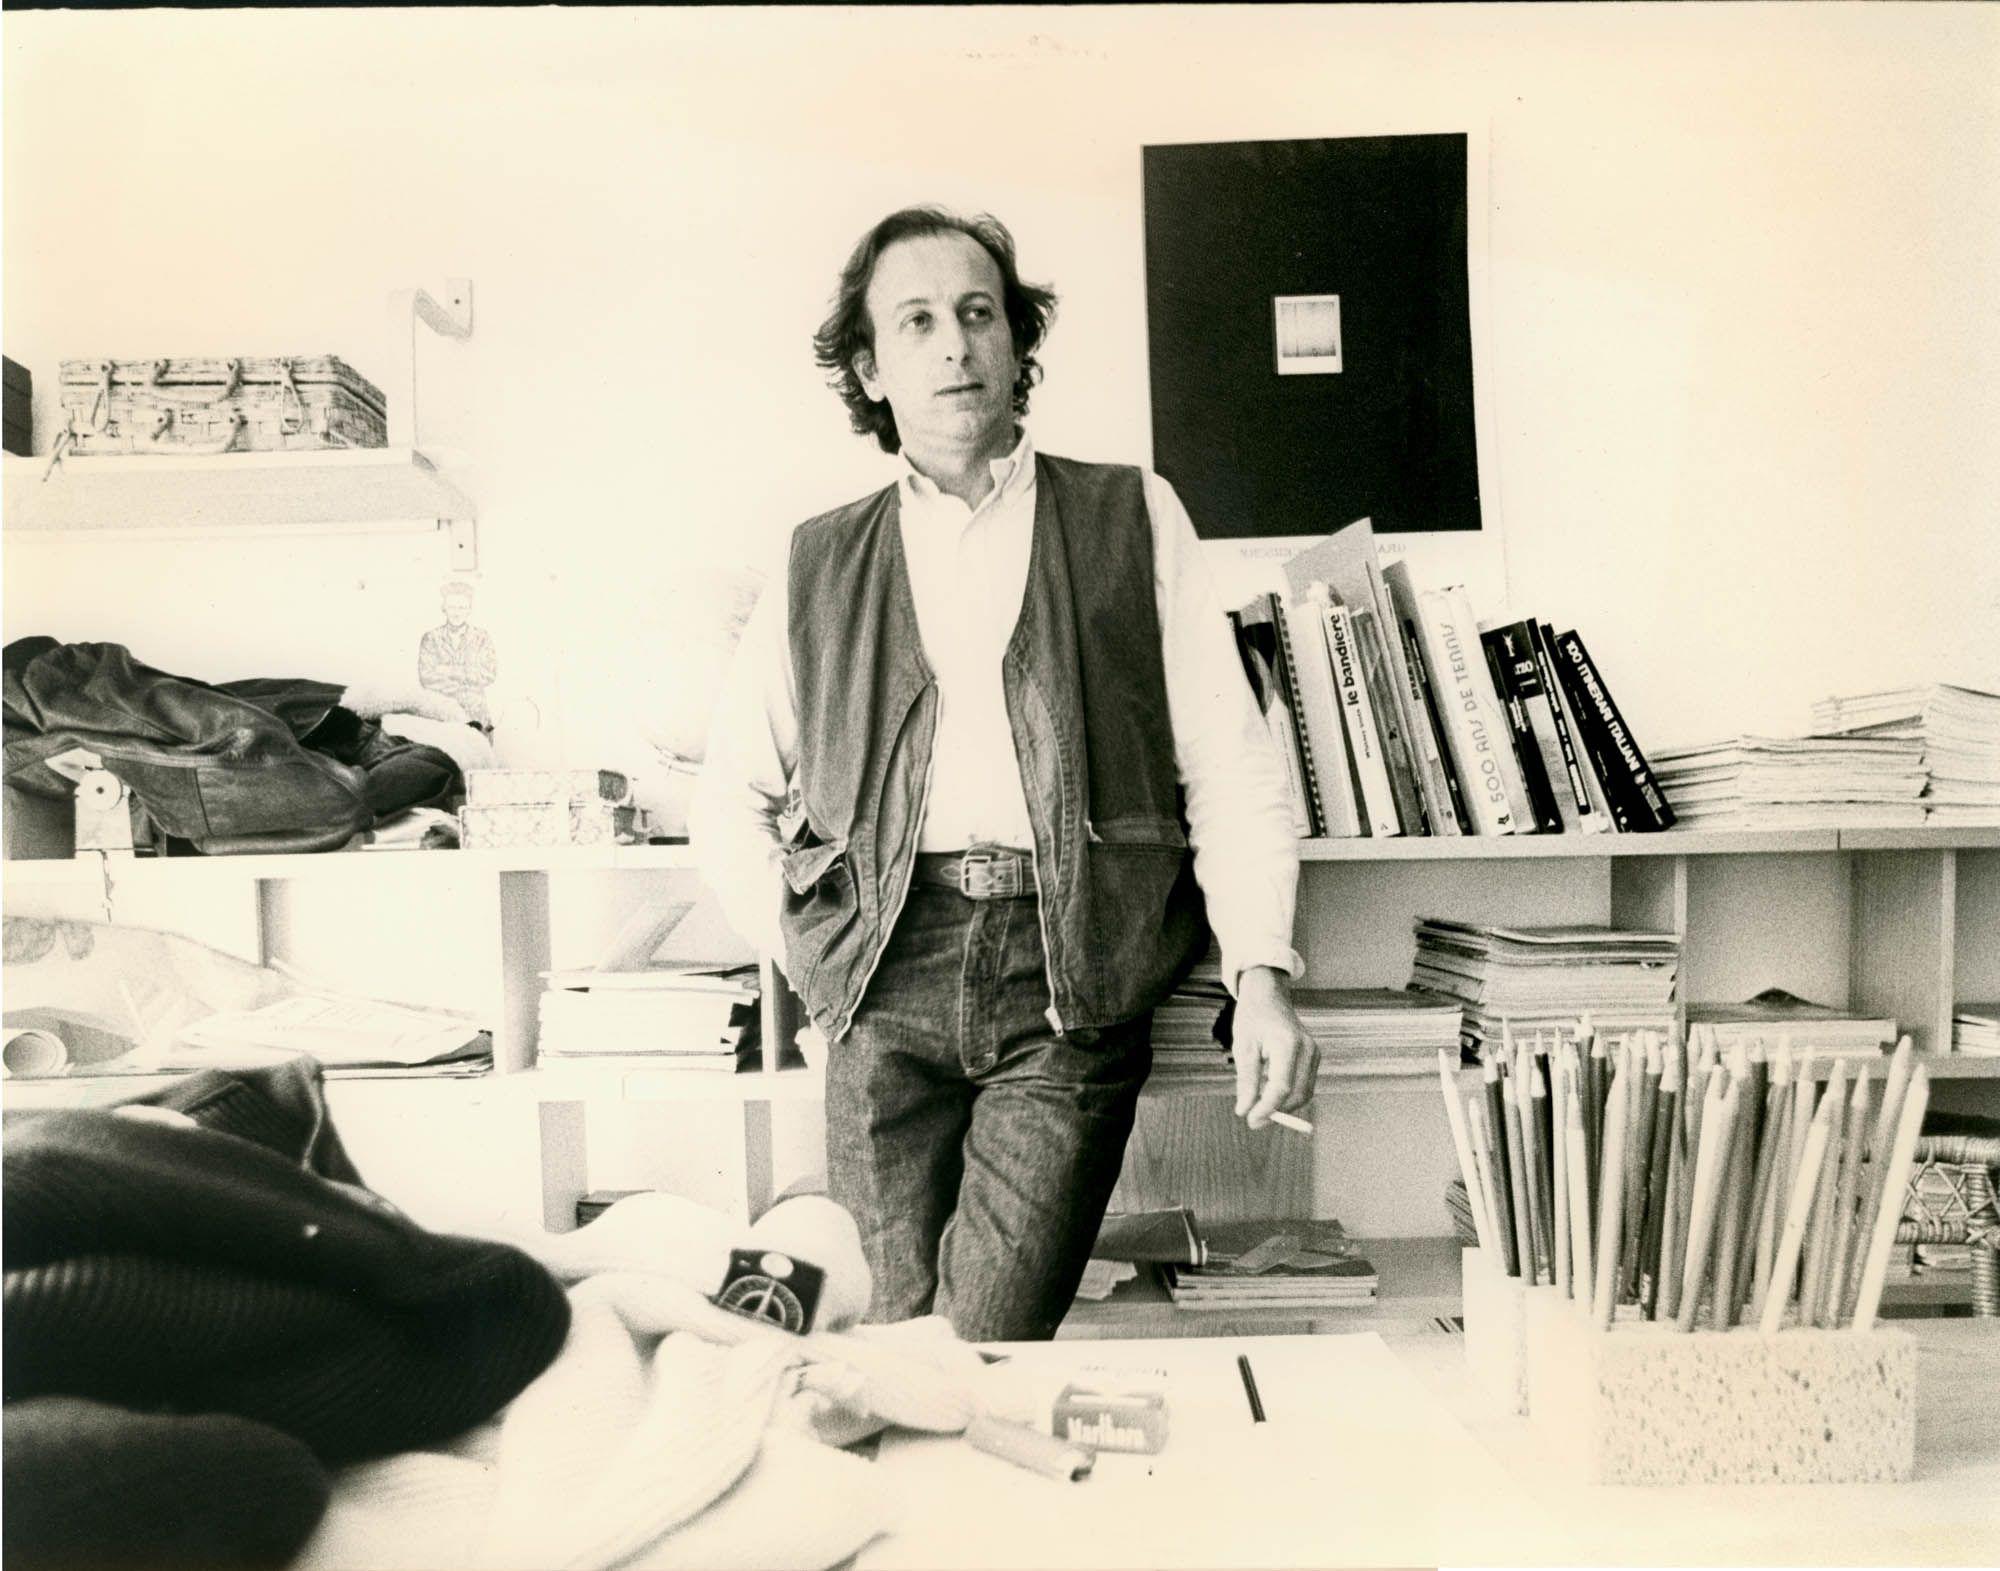 Massimo Osti in his studio, 1983